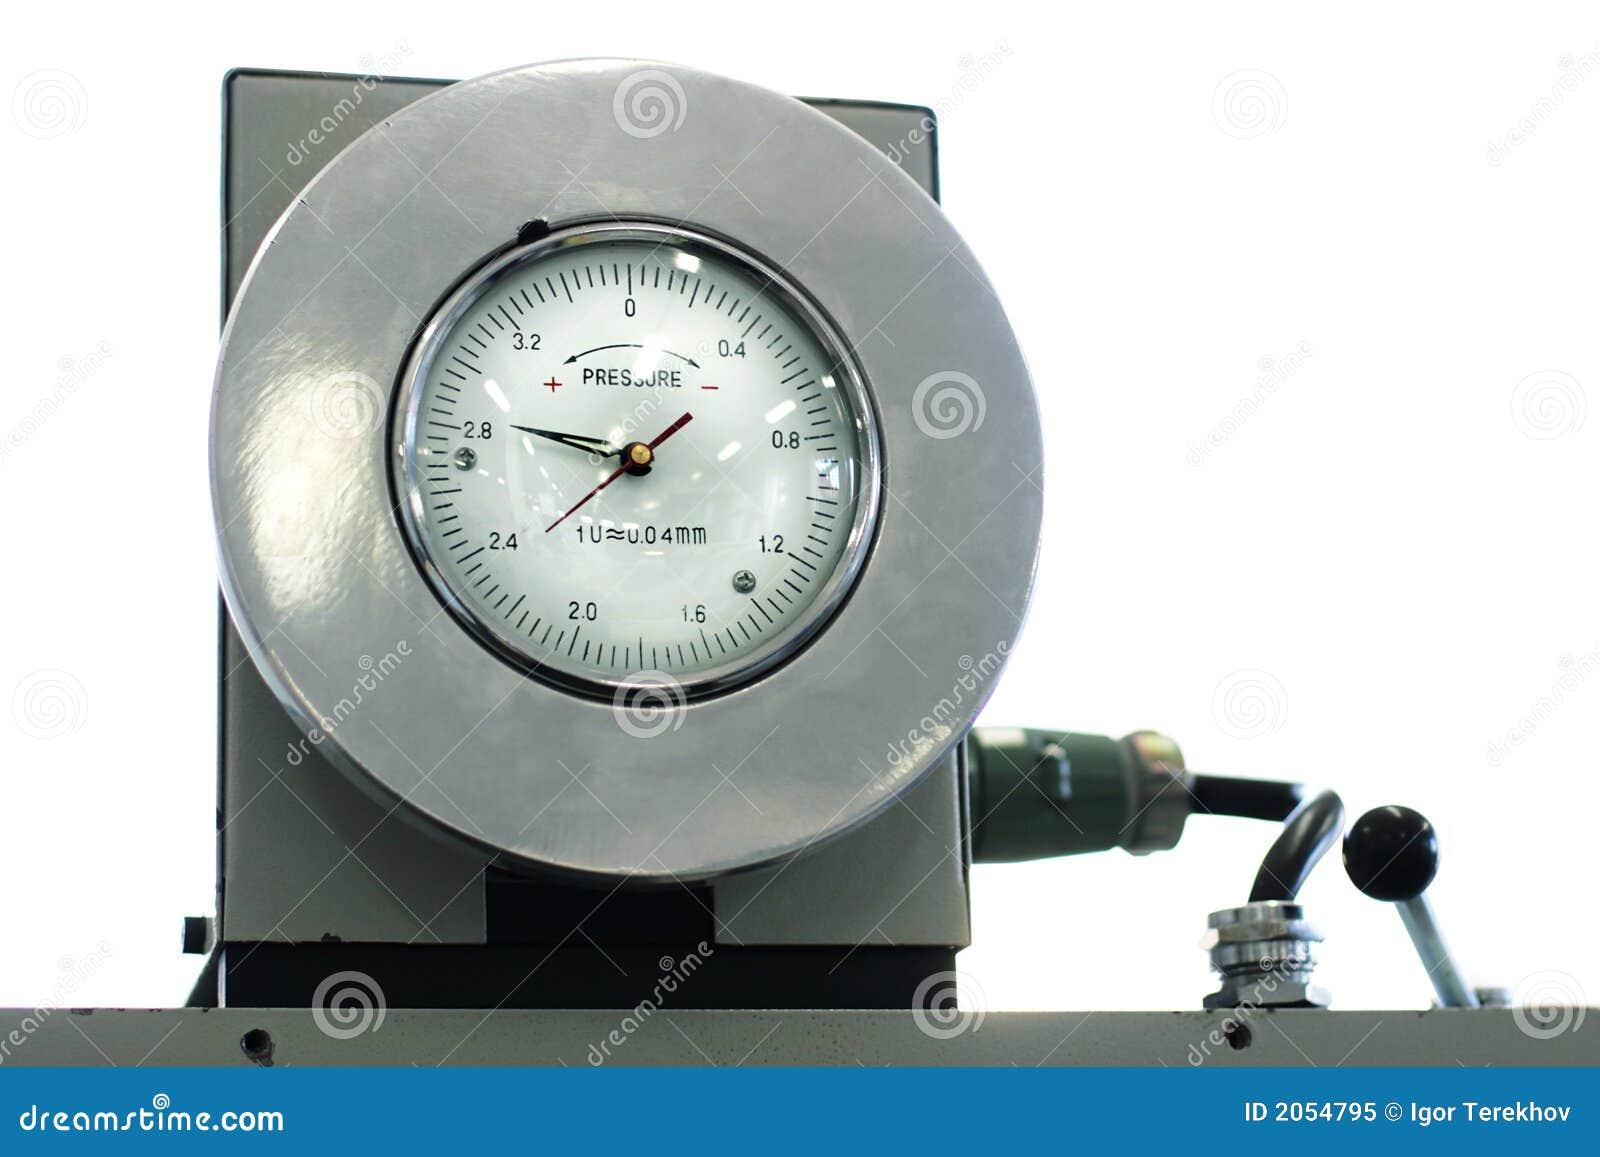 Indicator of pressure